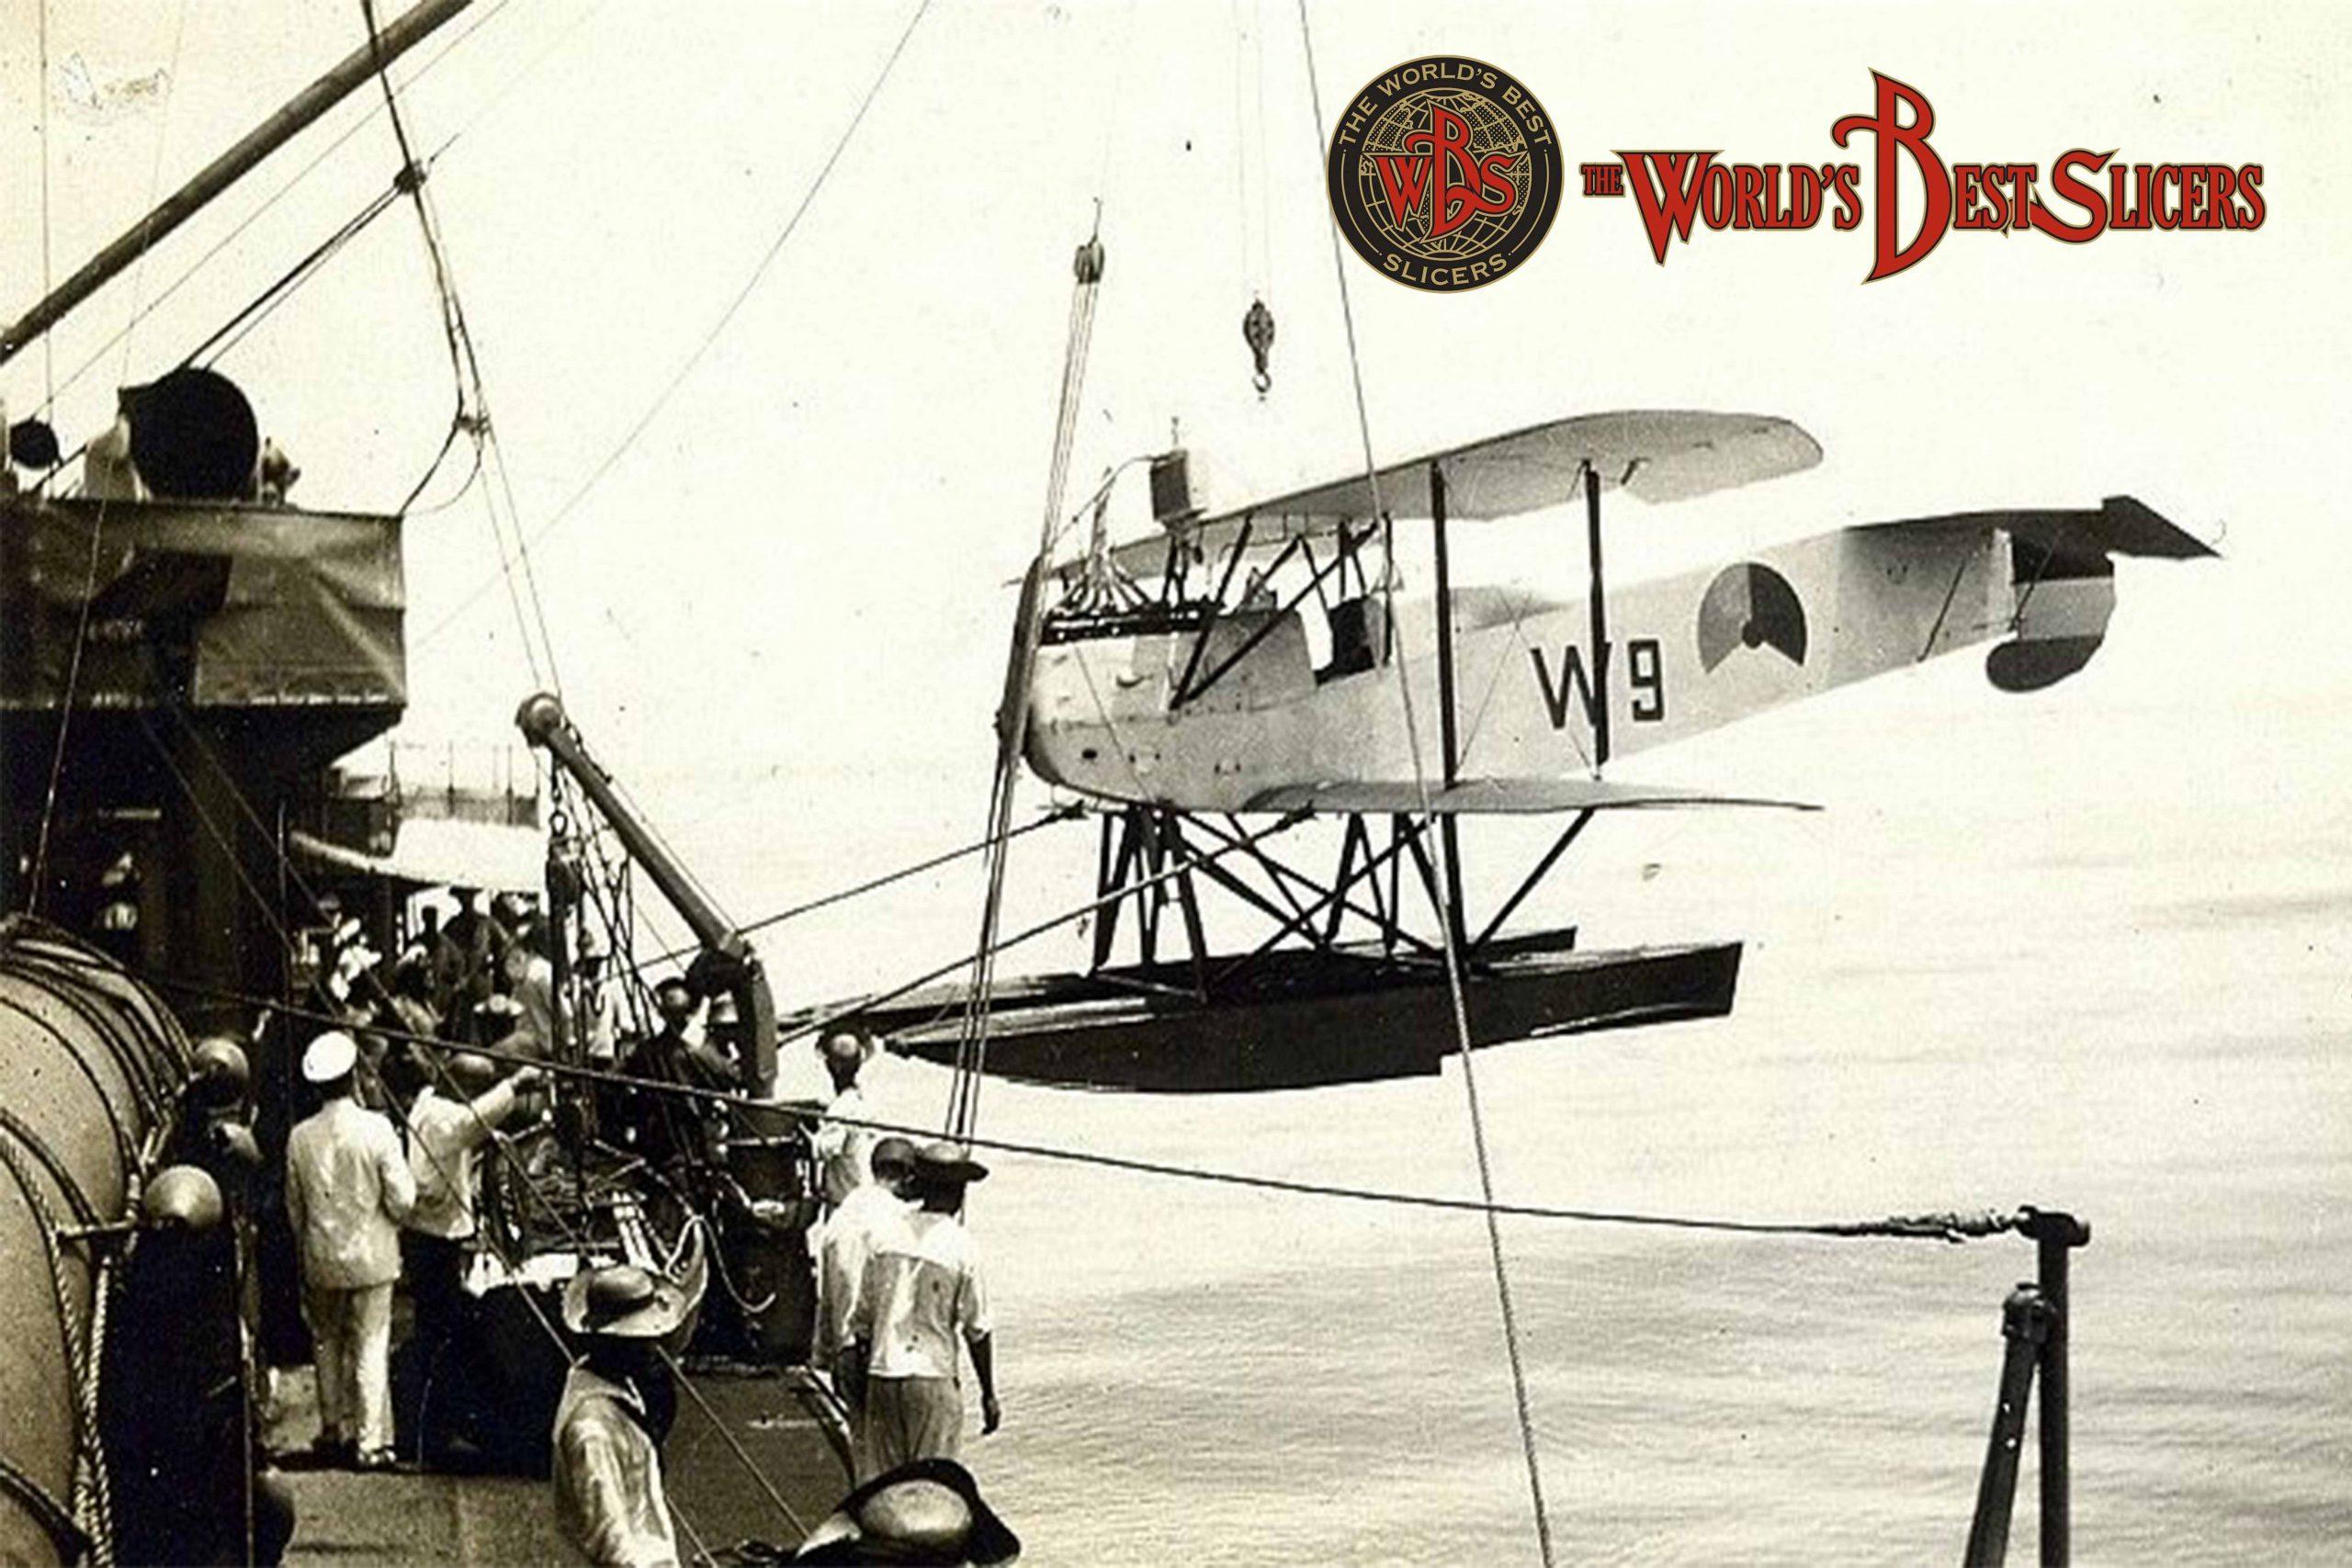 hp3-scaled W.A.Van Berkel's Geschichte